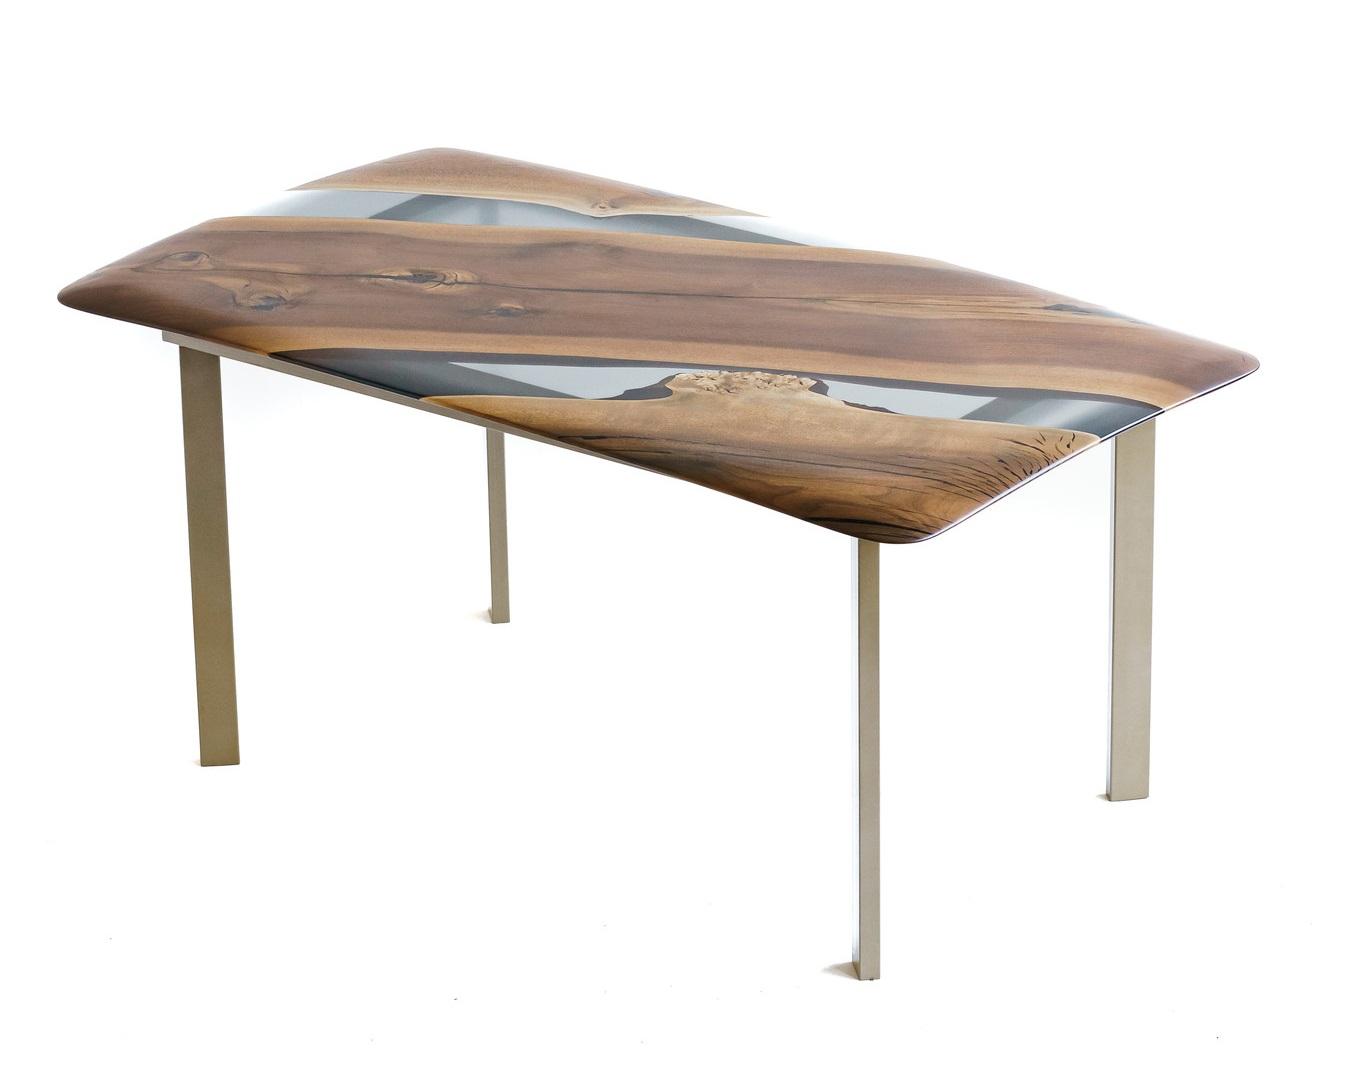 Обеденный стол (woodzpro) коричневый 90x75x160 см.